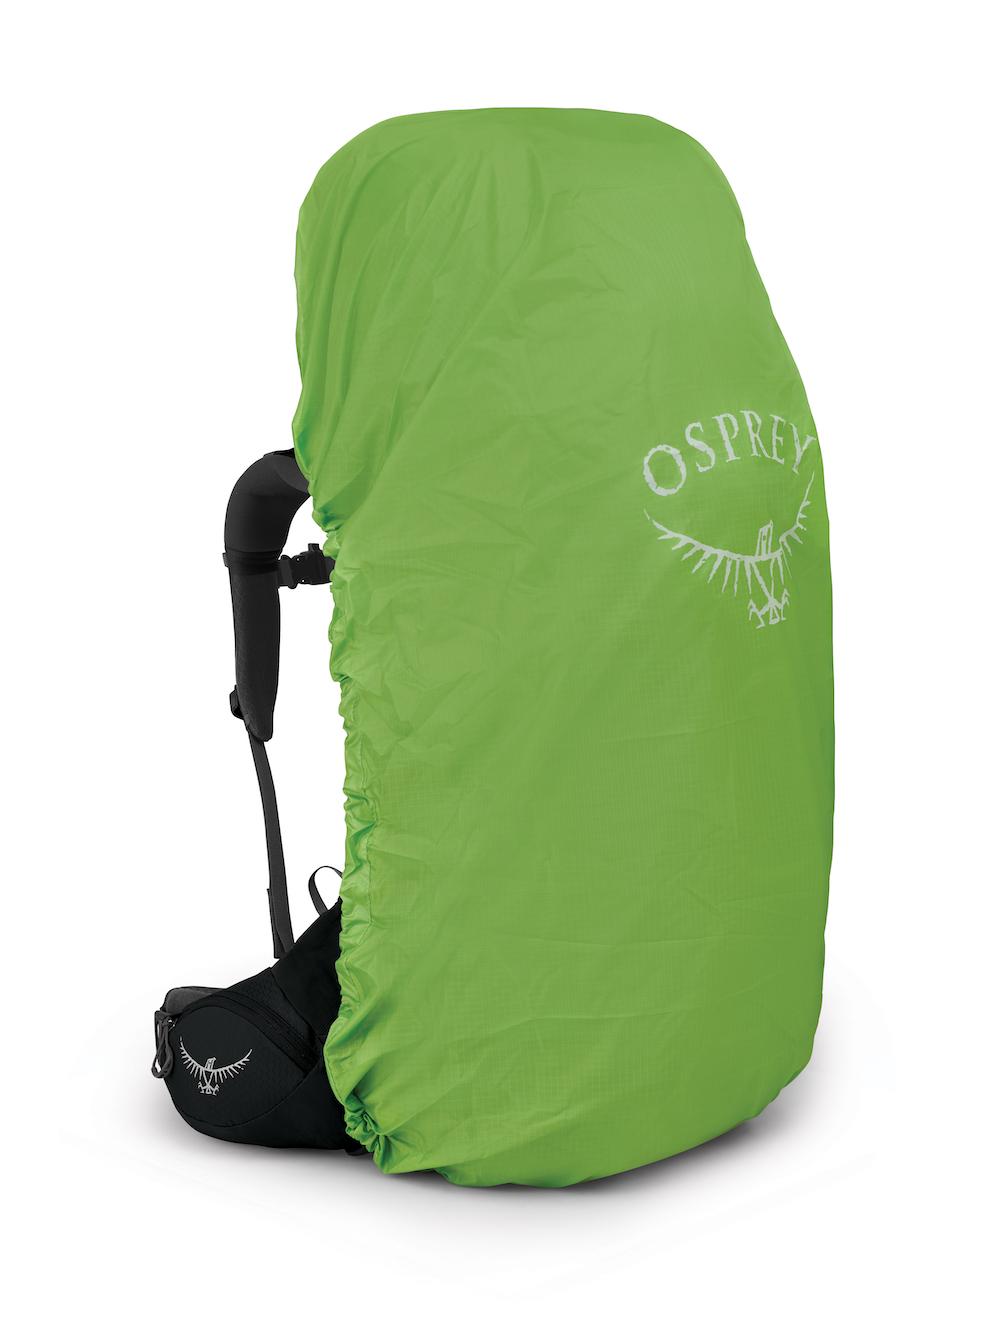 Osprey - Aether 65, Expeditionsrucksack